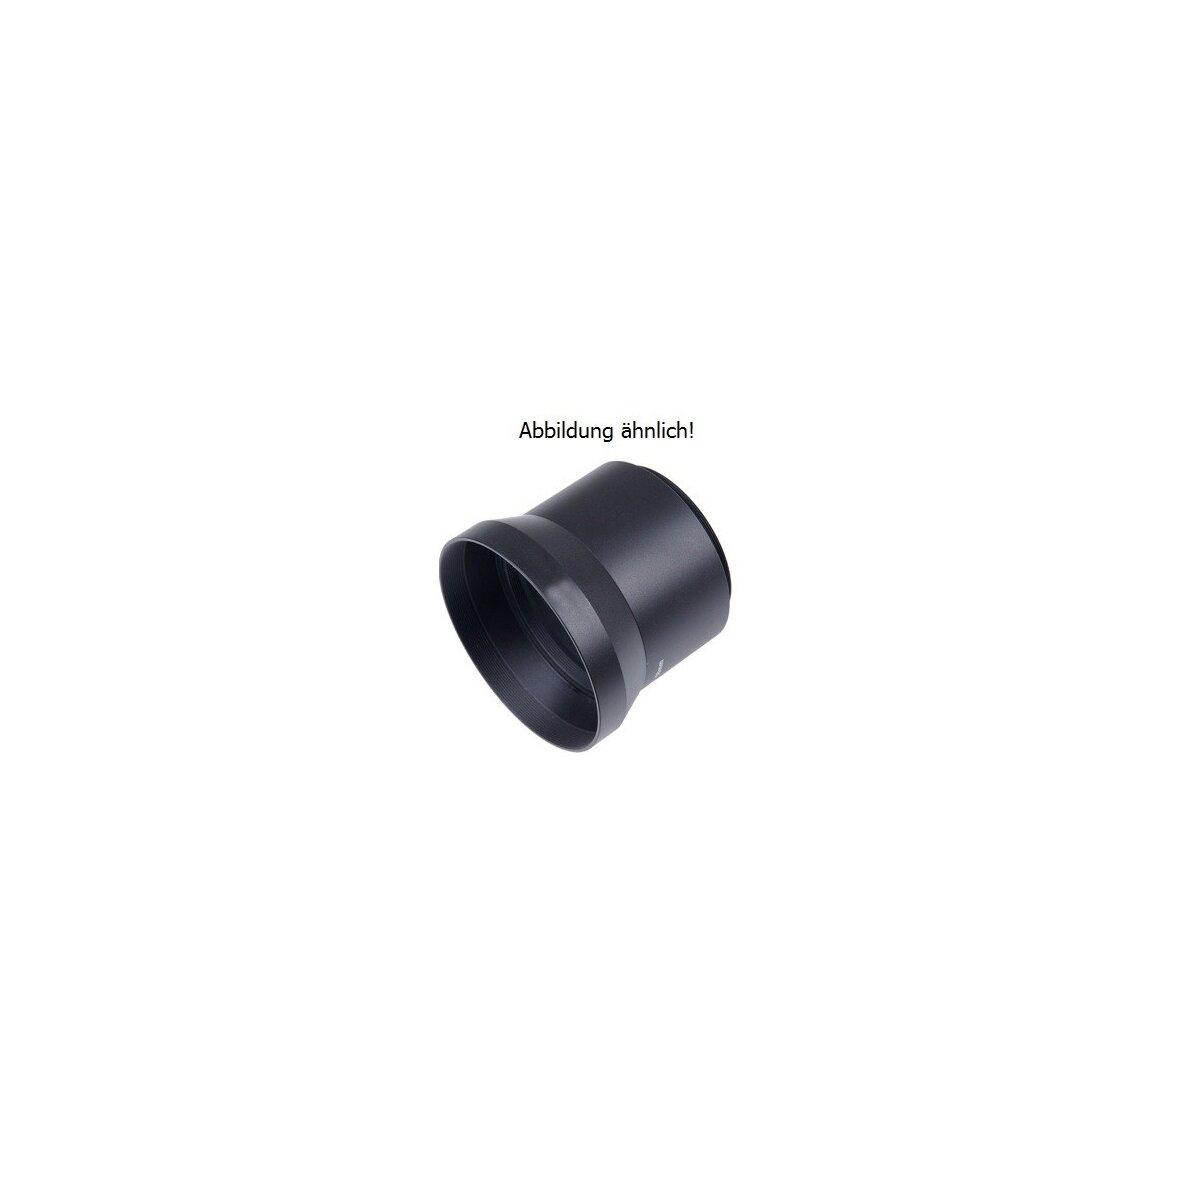 Adaptertubus fuer Nikon CoolPix 5400 mit 52mm